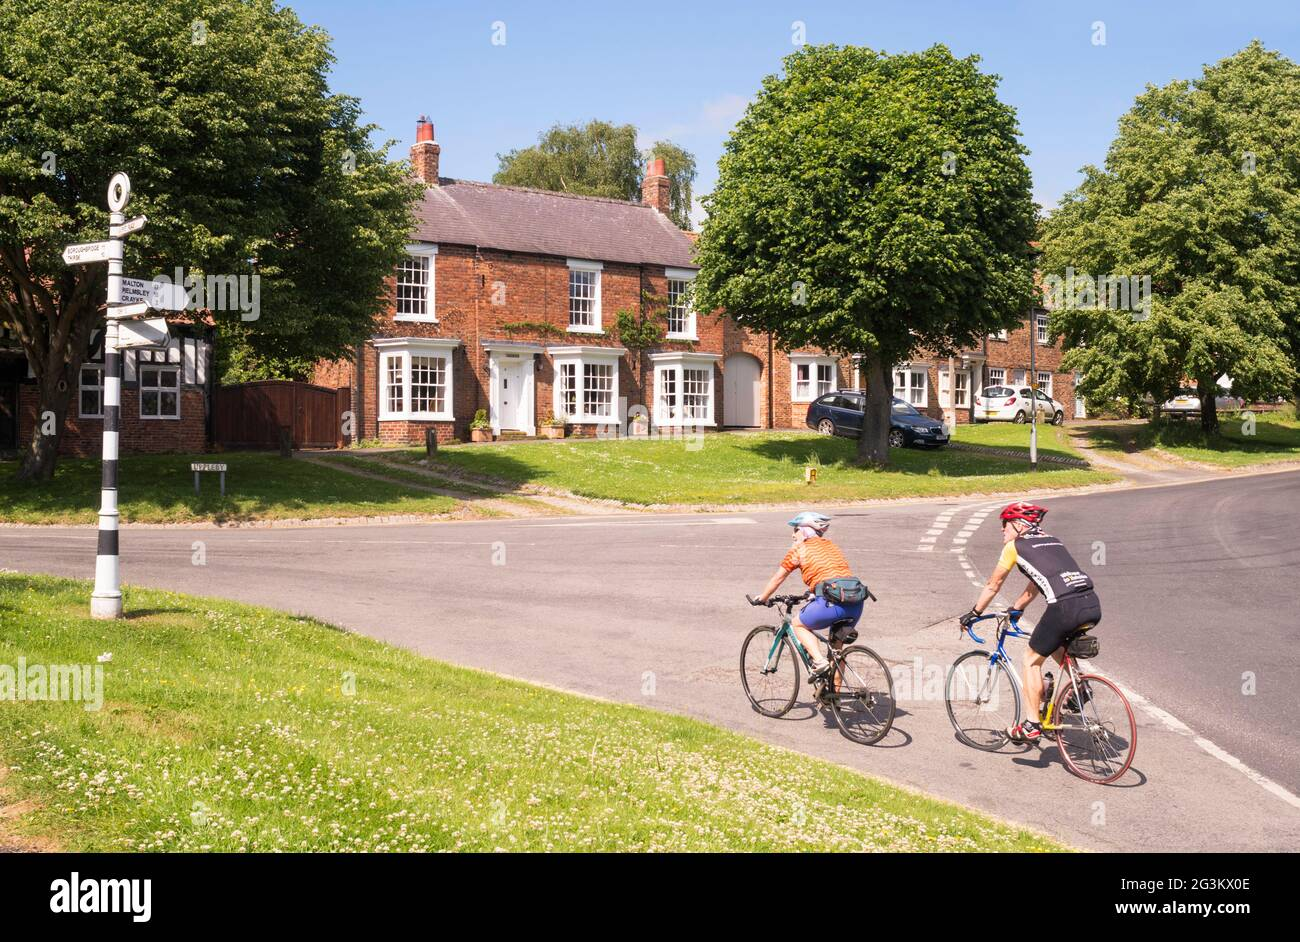 couple-cycling-through-easingwold-north-yorkshire-england-uk-2G3KX0E.jpg